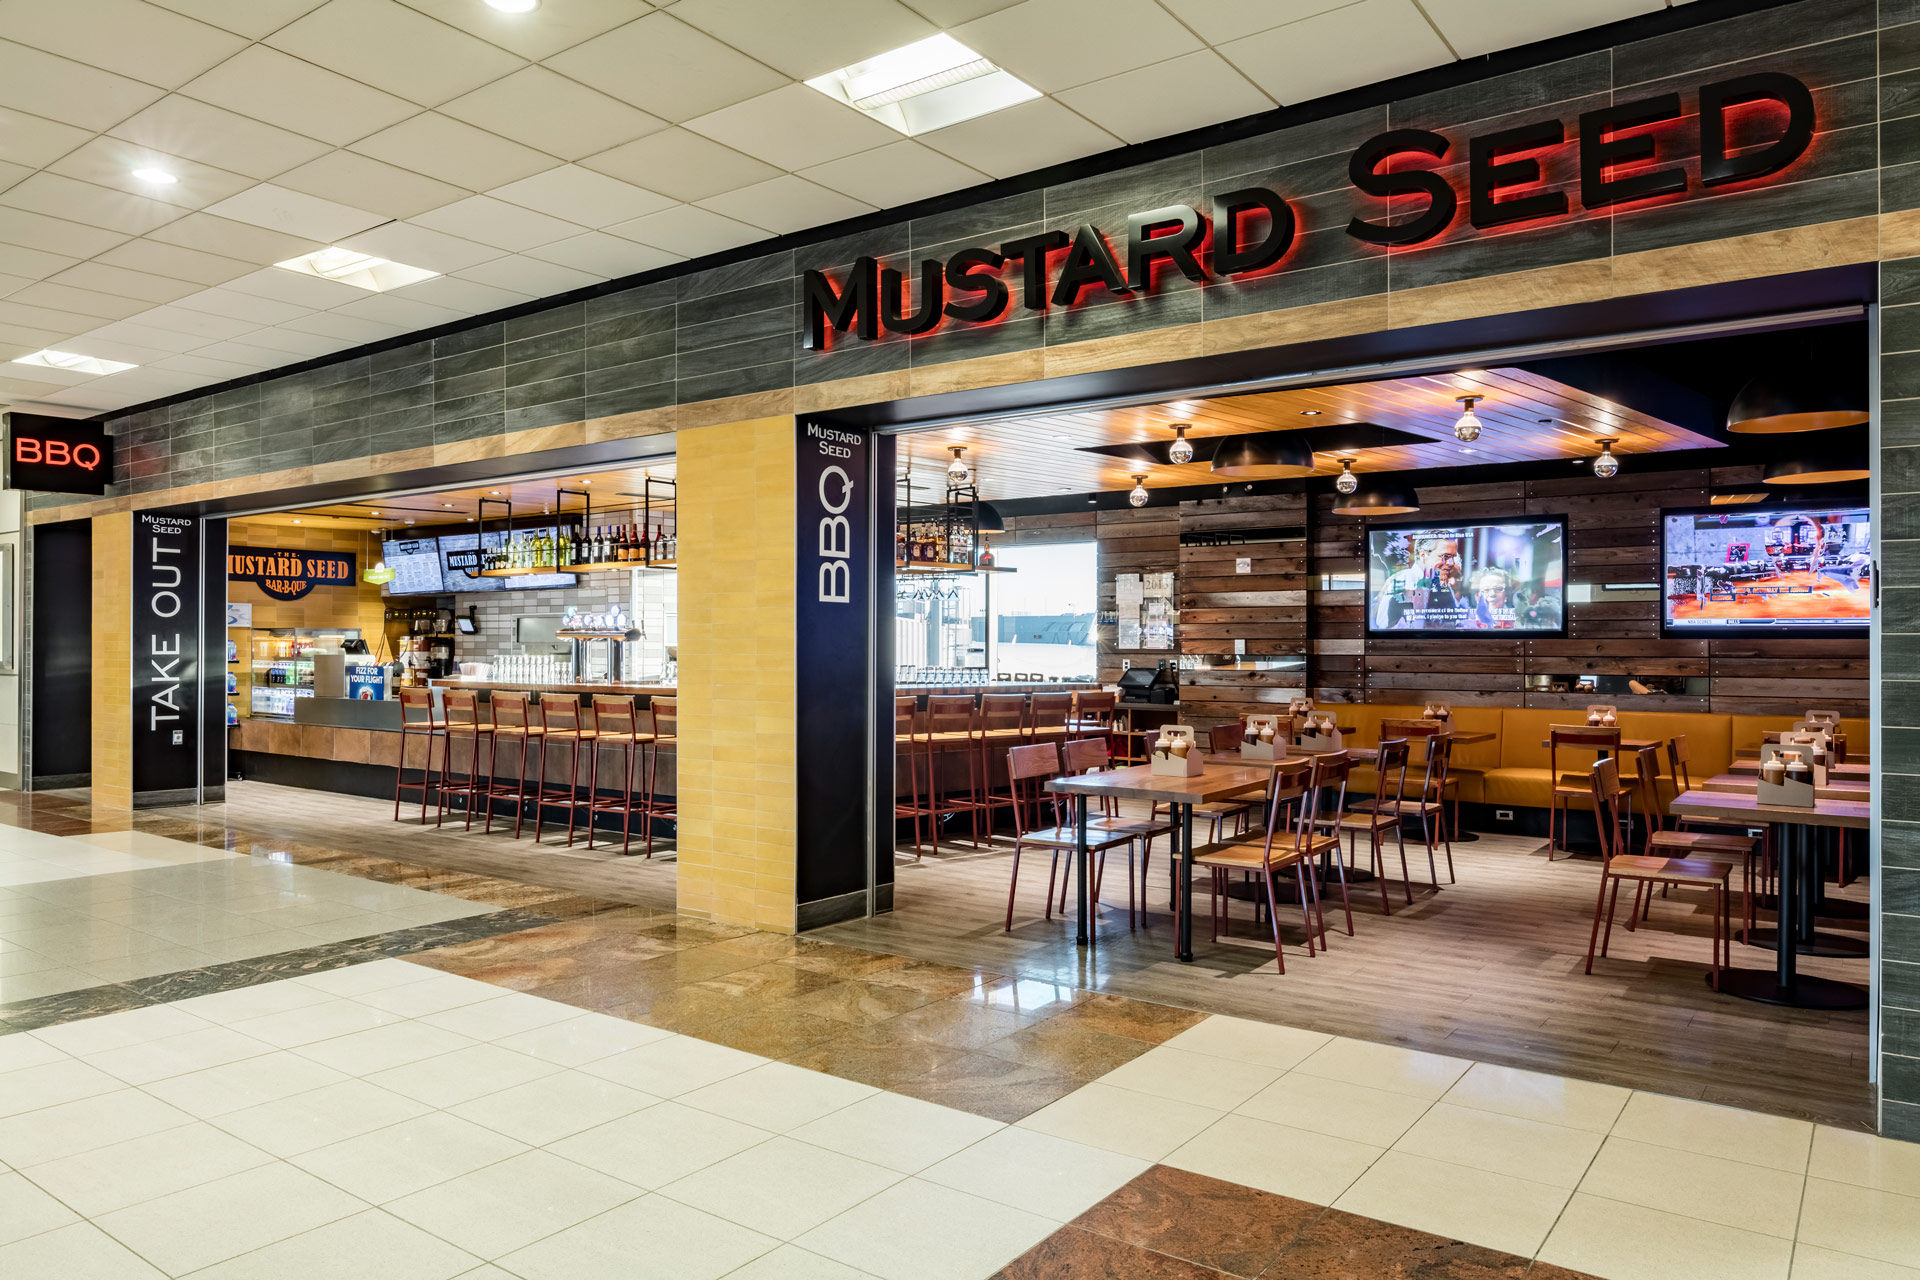 Mustard Seed restaurant design ideas